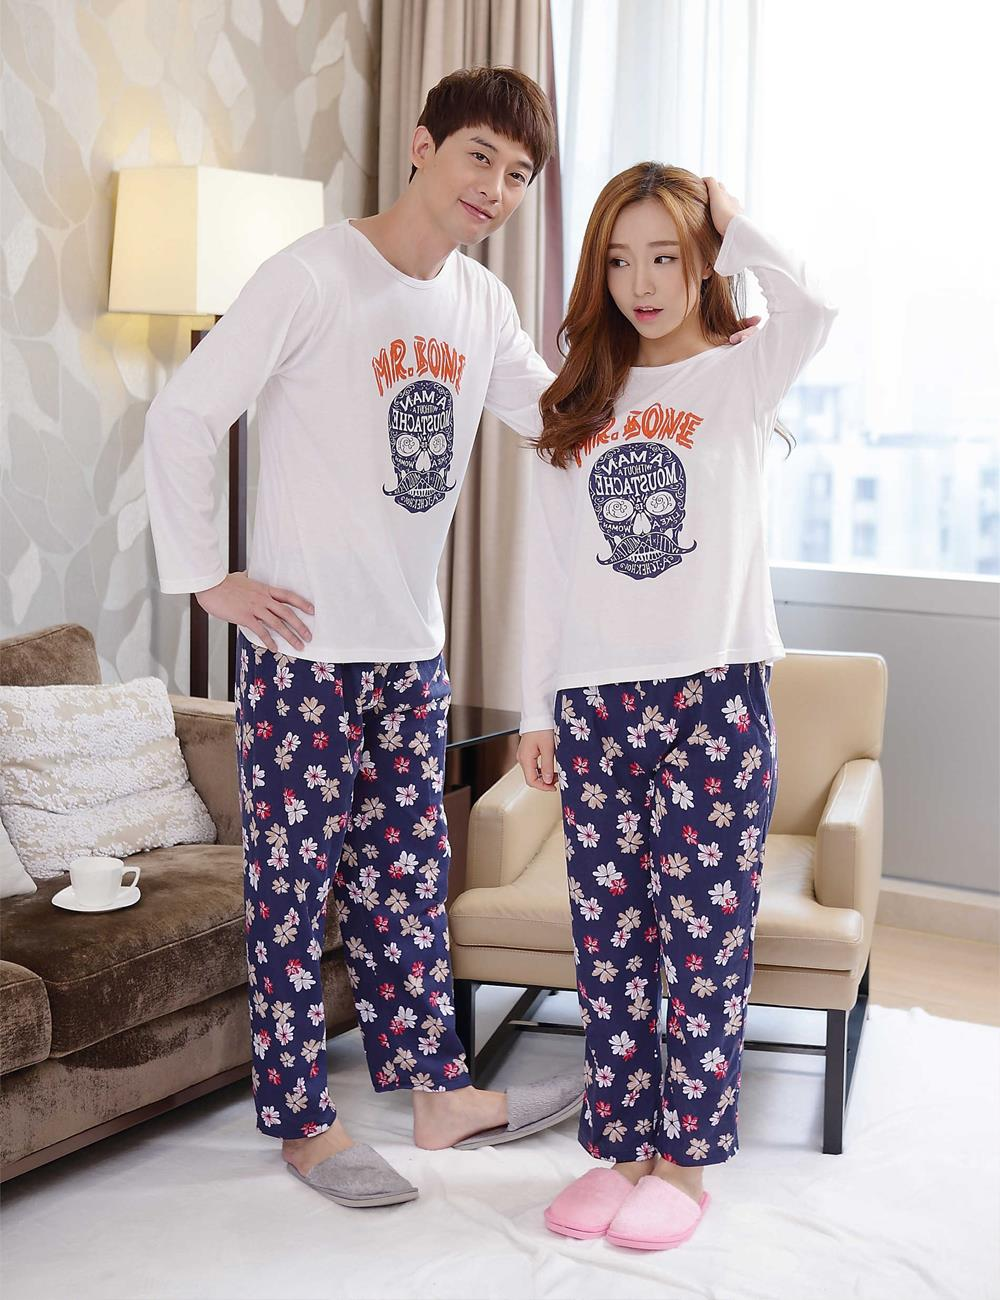 aa83da70c2 Cheep Nightgown Pajamas Blouse+Pants Cotton Skull couple pajama sets,couples  matching pajamas,abbigliamento donna,cheap goods-in Pajama Sets from  Underwear ...